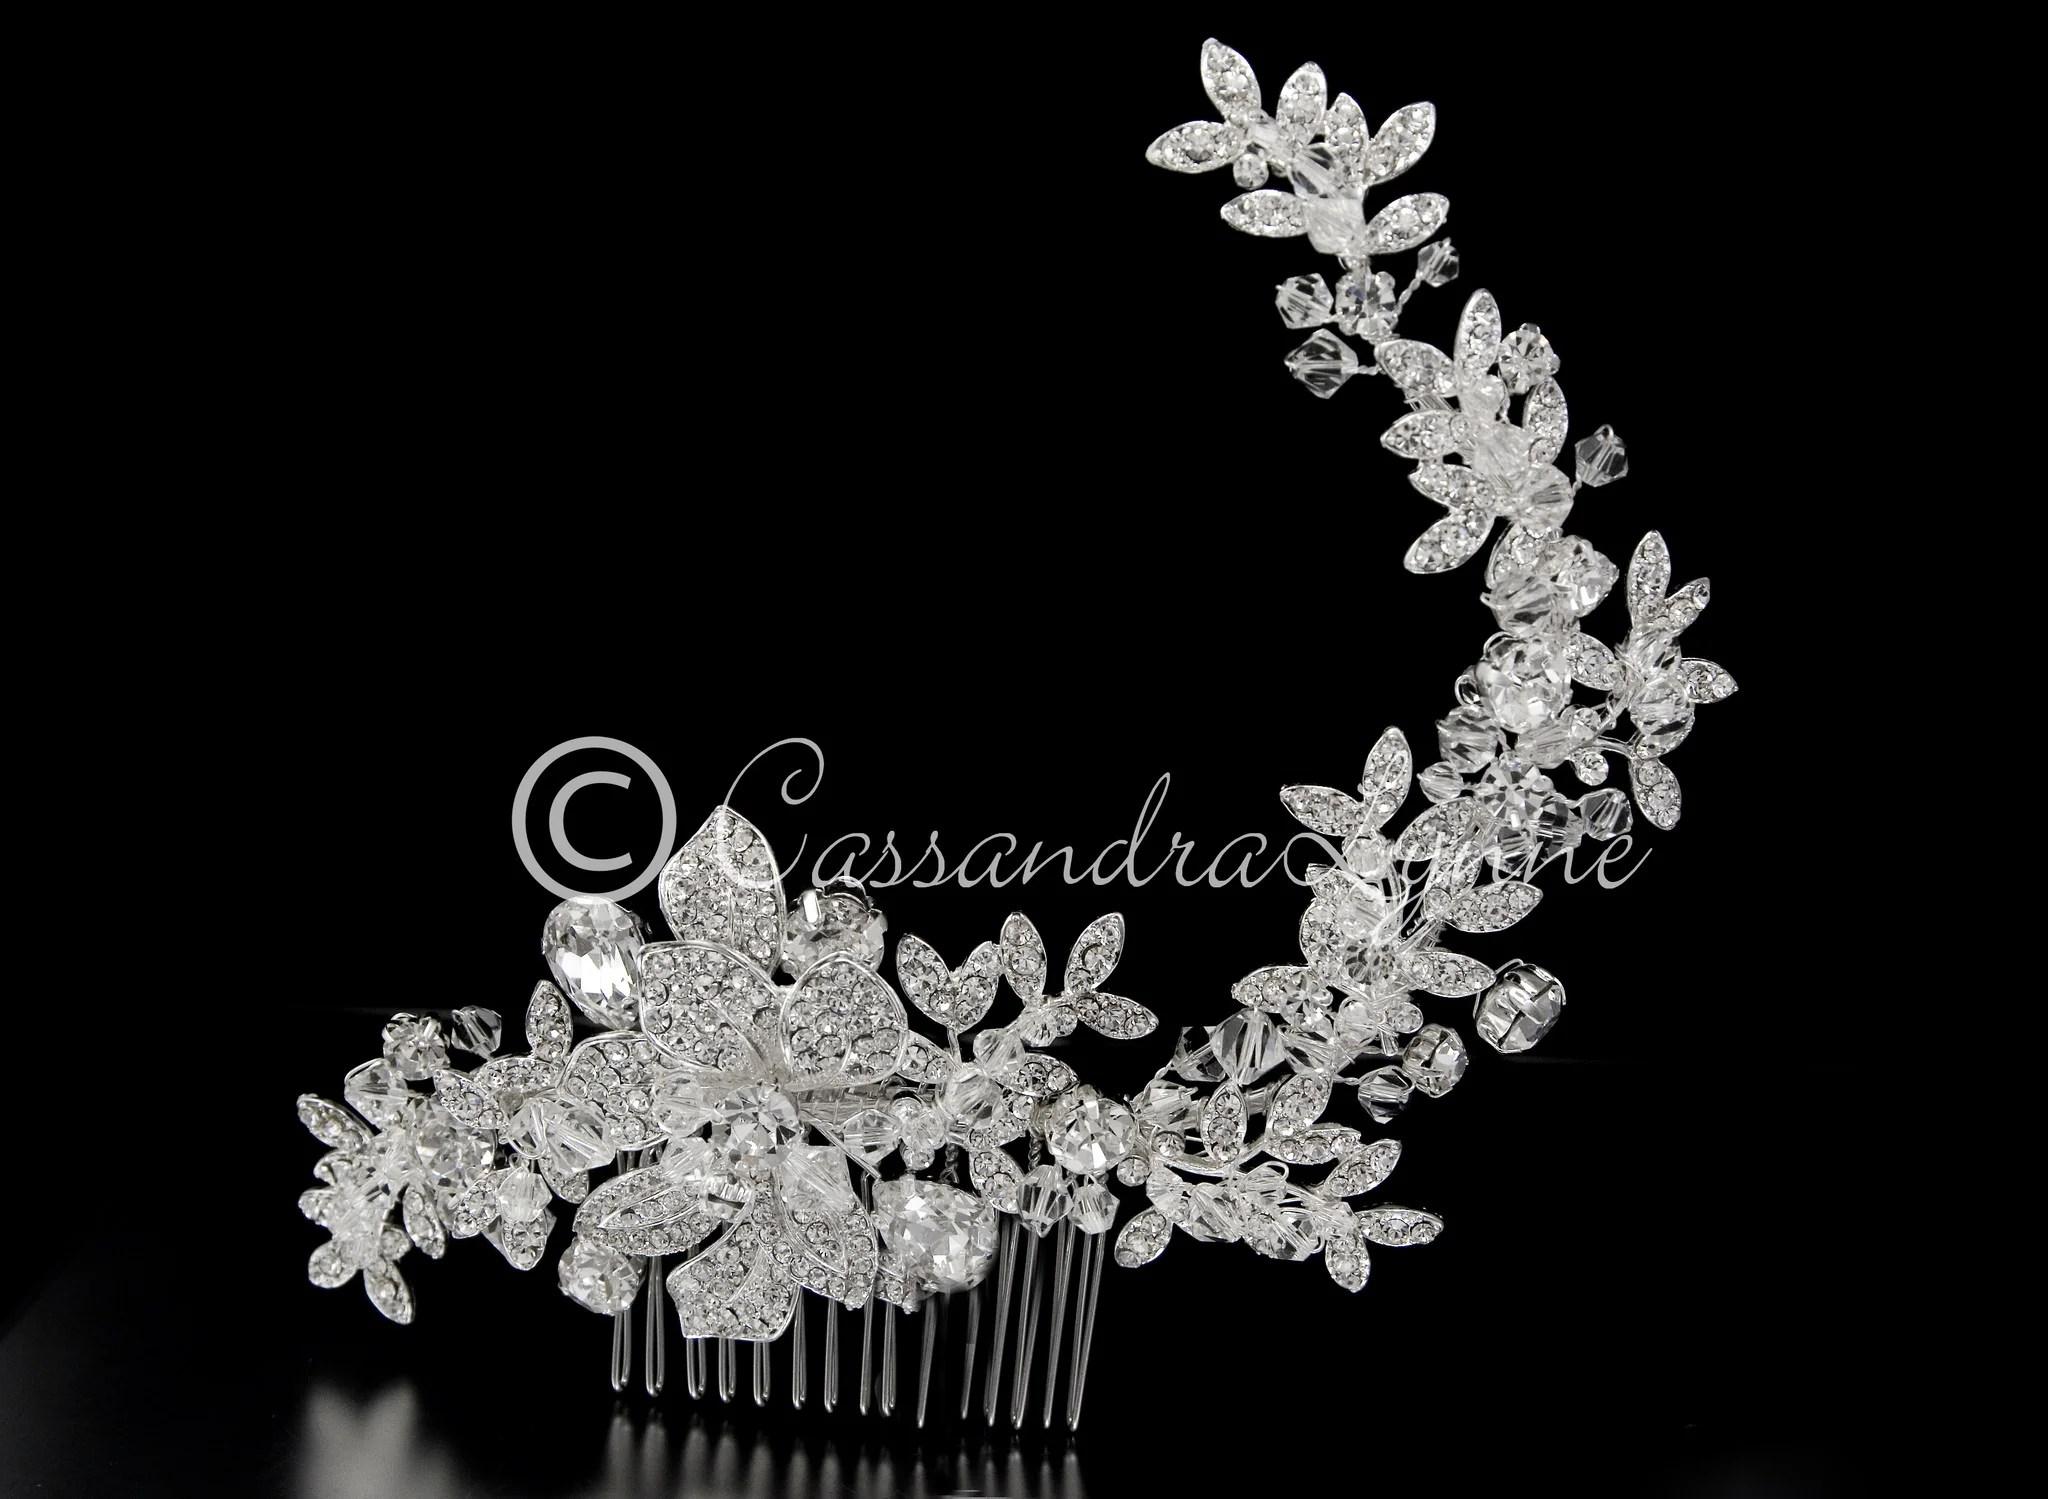 crystal bridal hair comb in a rhinestone vine design wedding hair combs Crystal Bridal Hair Comb in a Rhinestone Vine Design